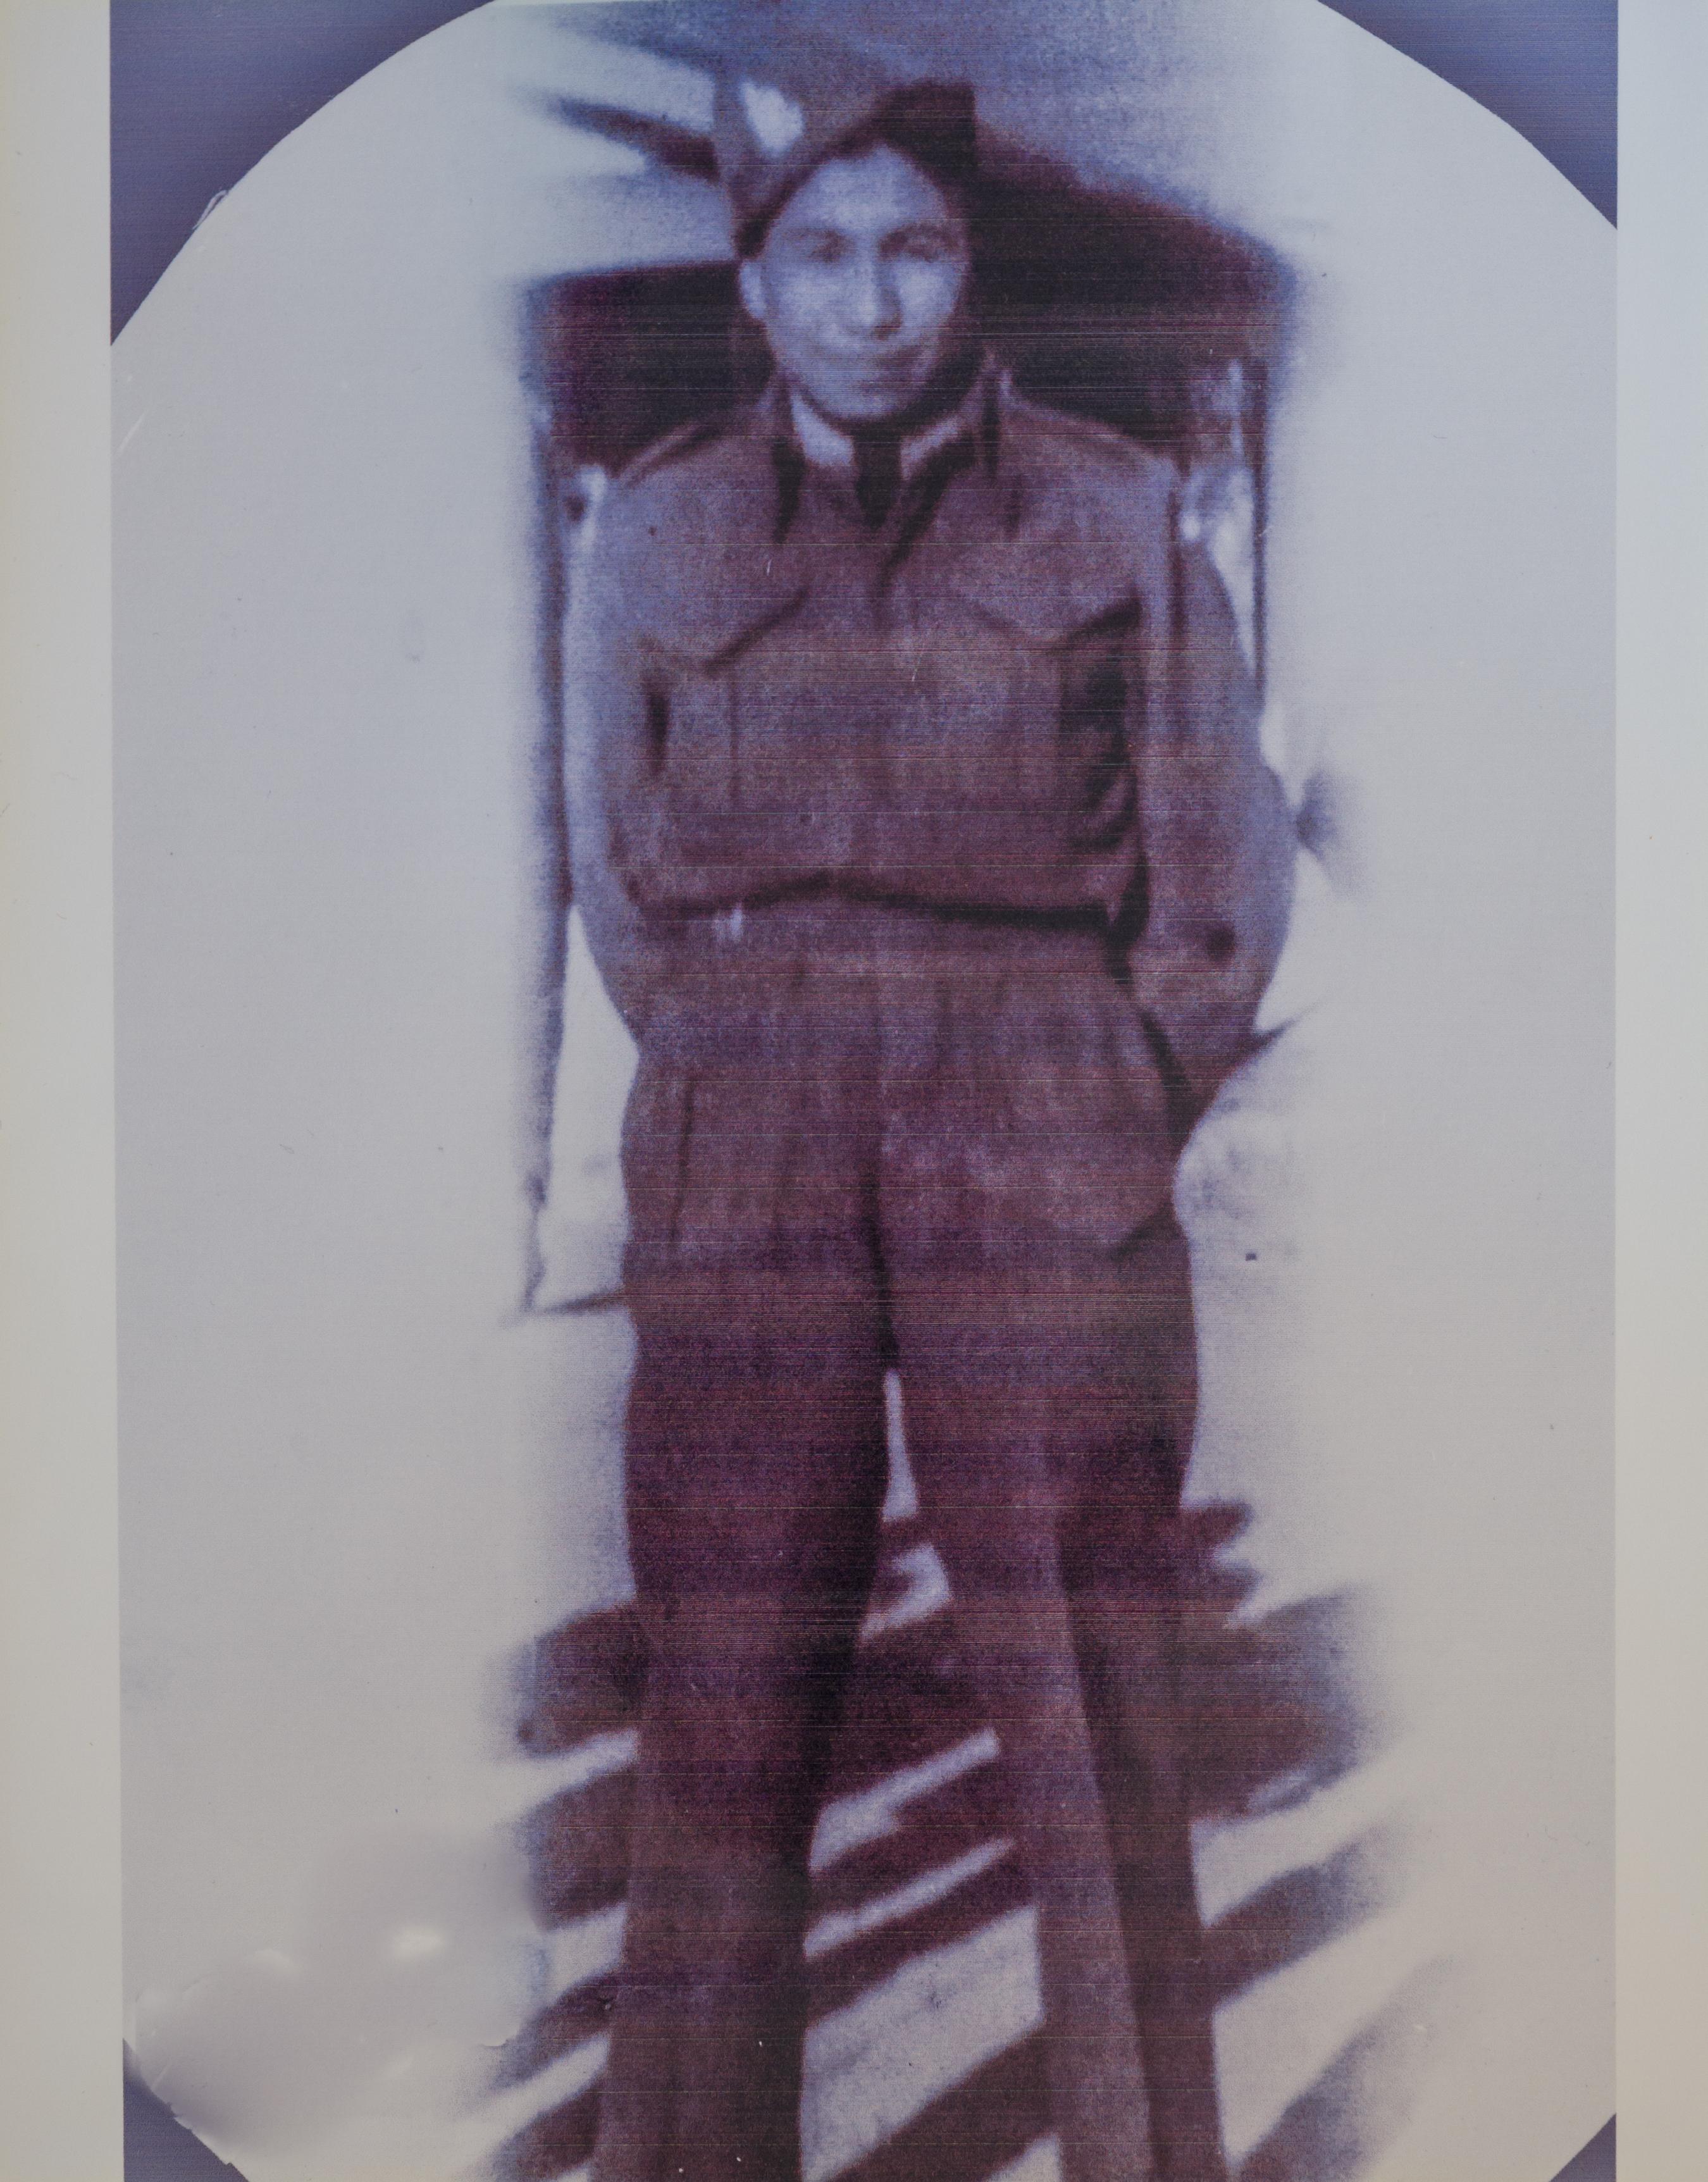 Canadian Fallen Soldier - Rifleman JOE POUCETTE